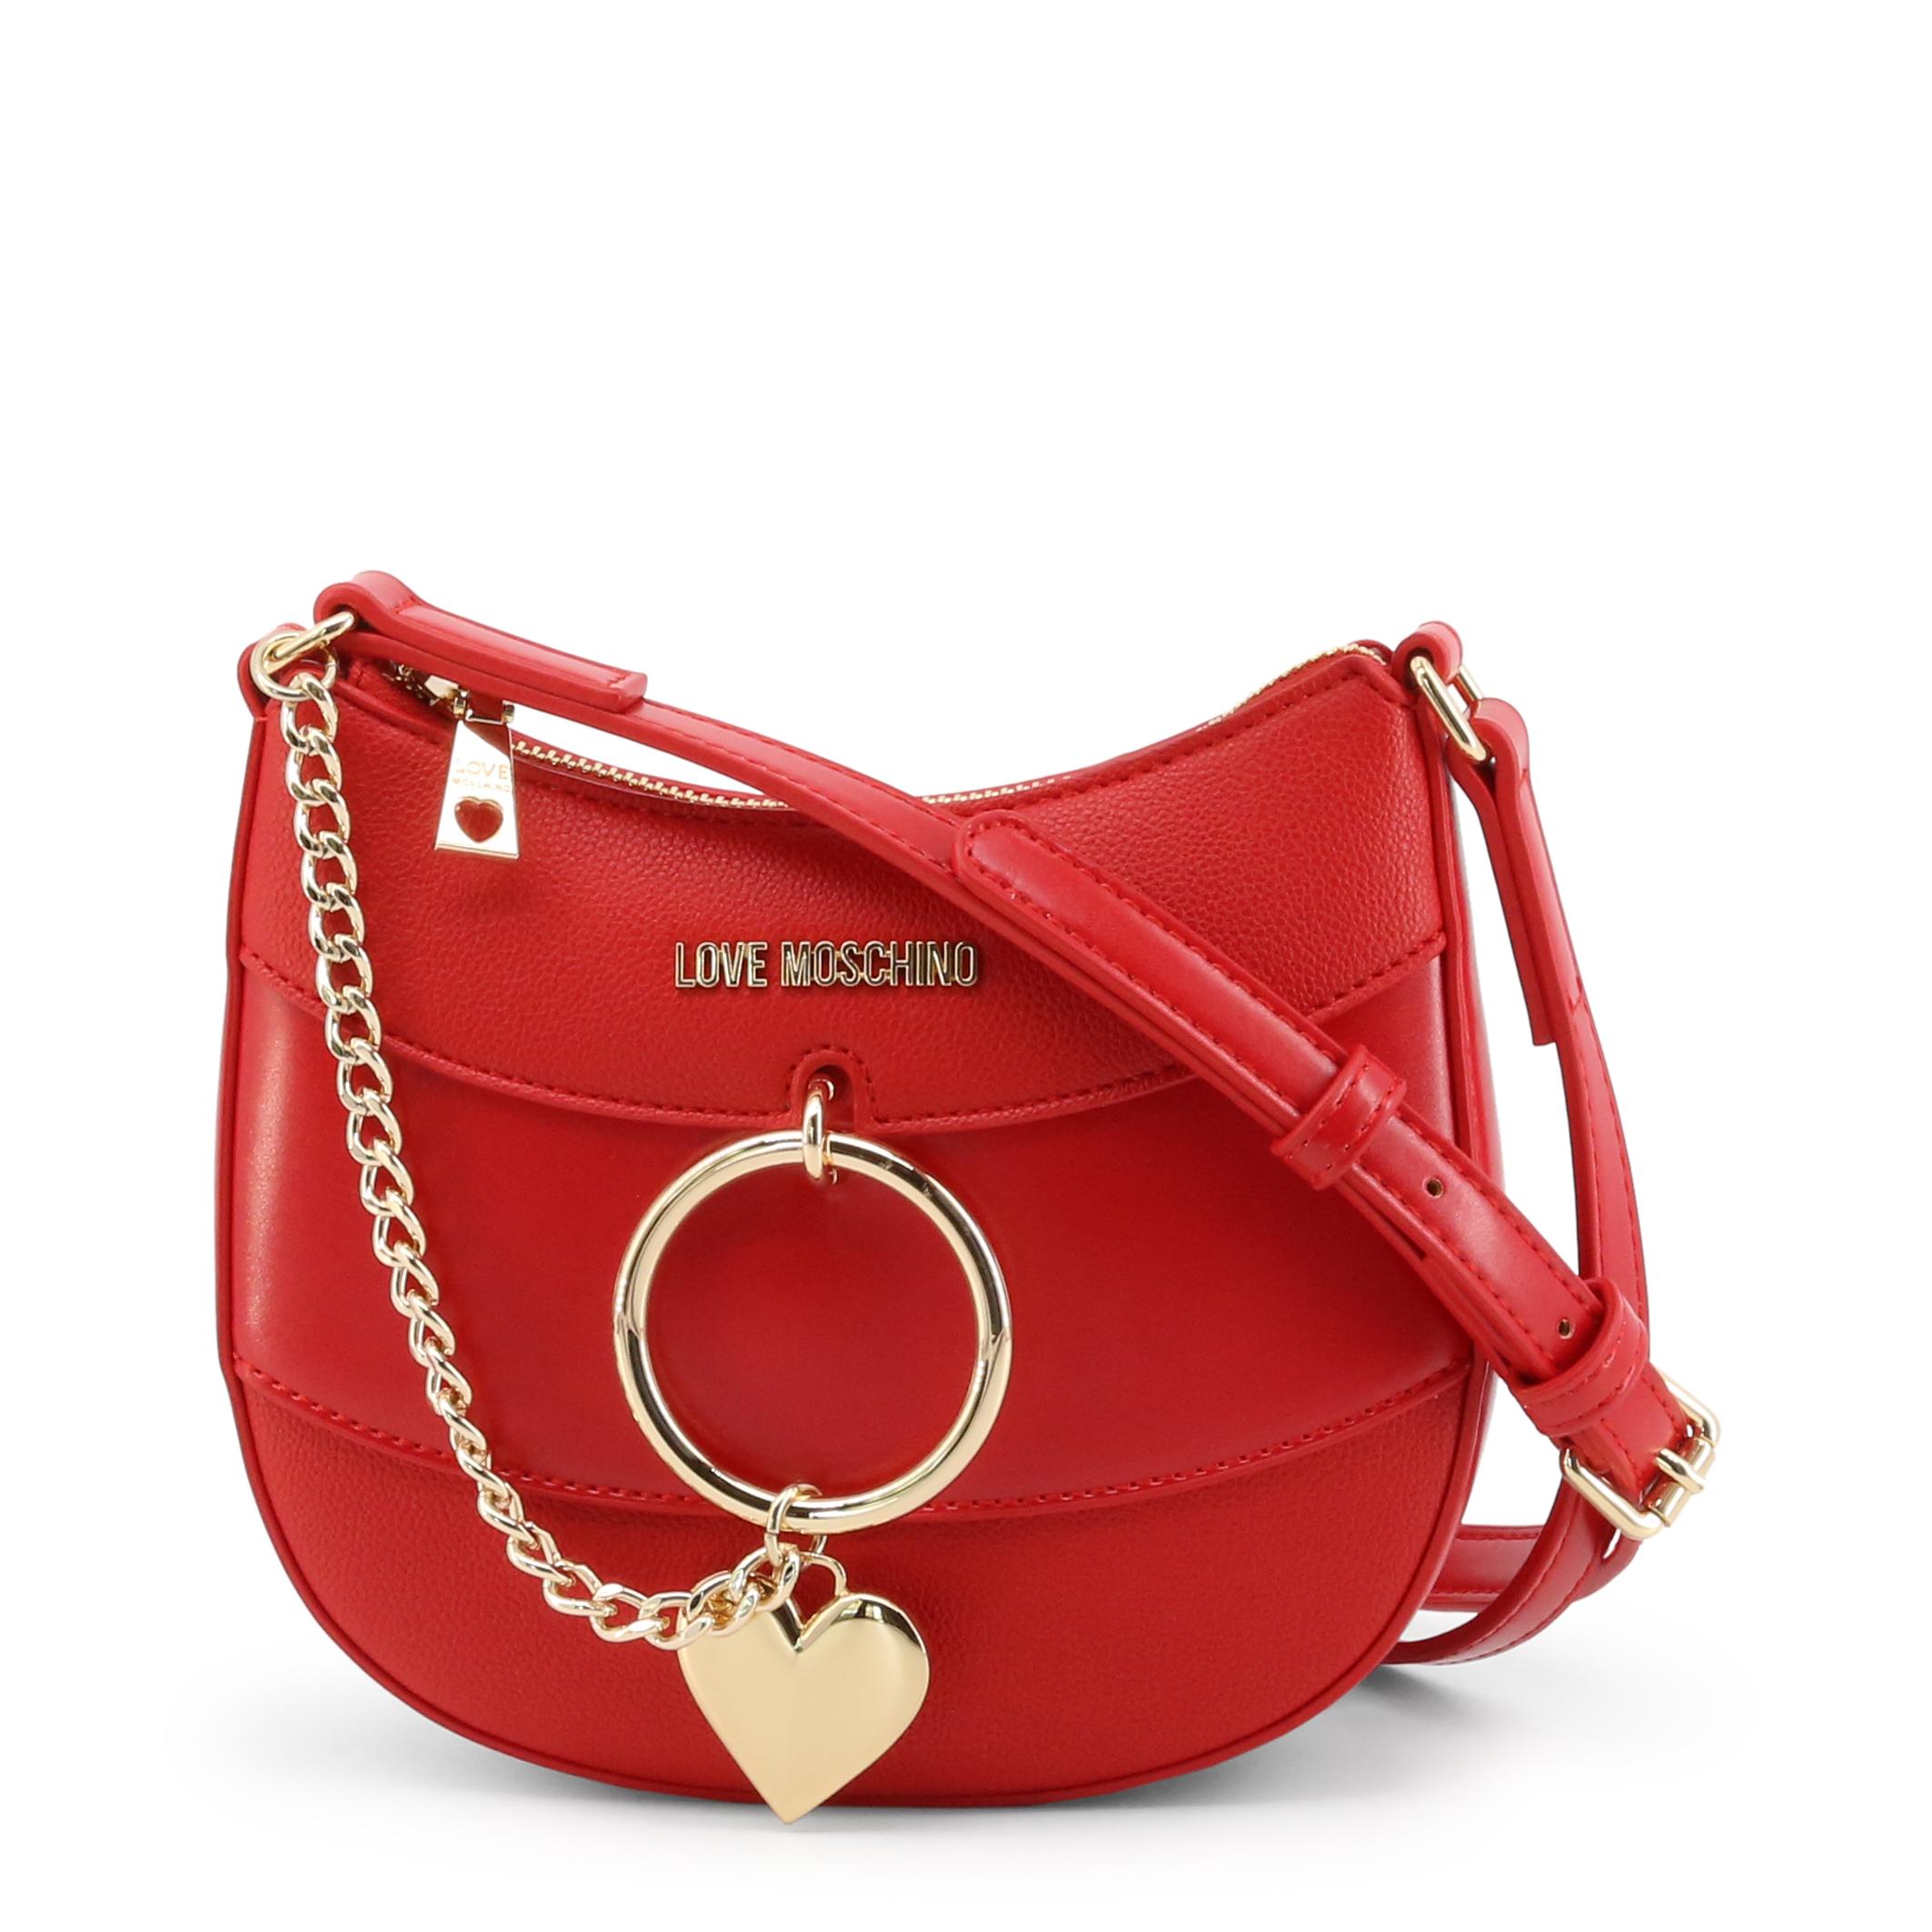 Love Moschino - JC4239PP0CKF1 - Red